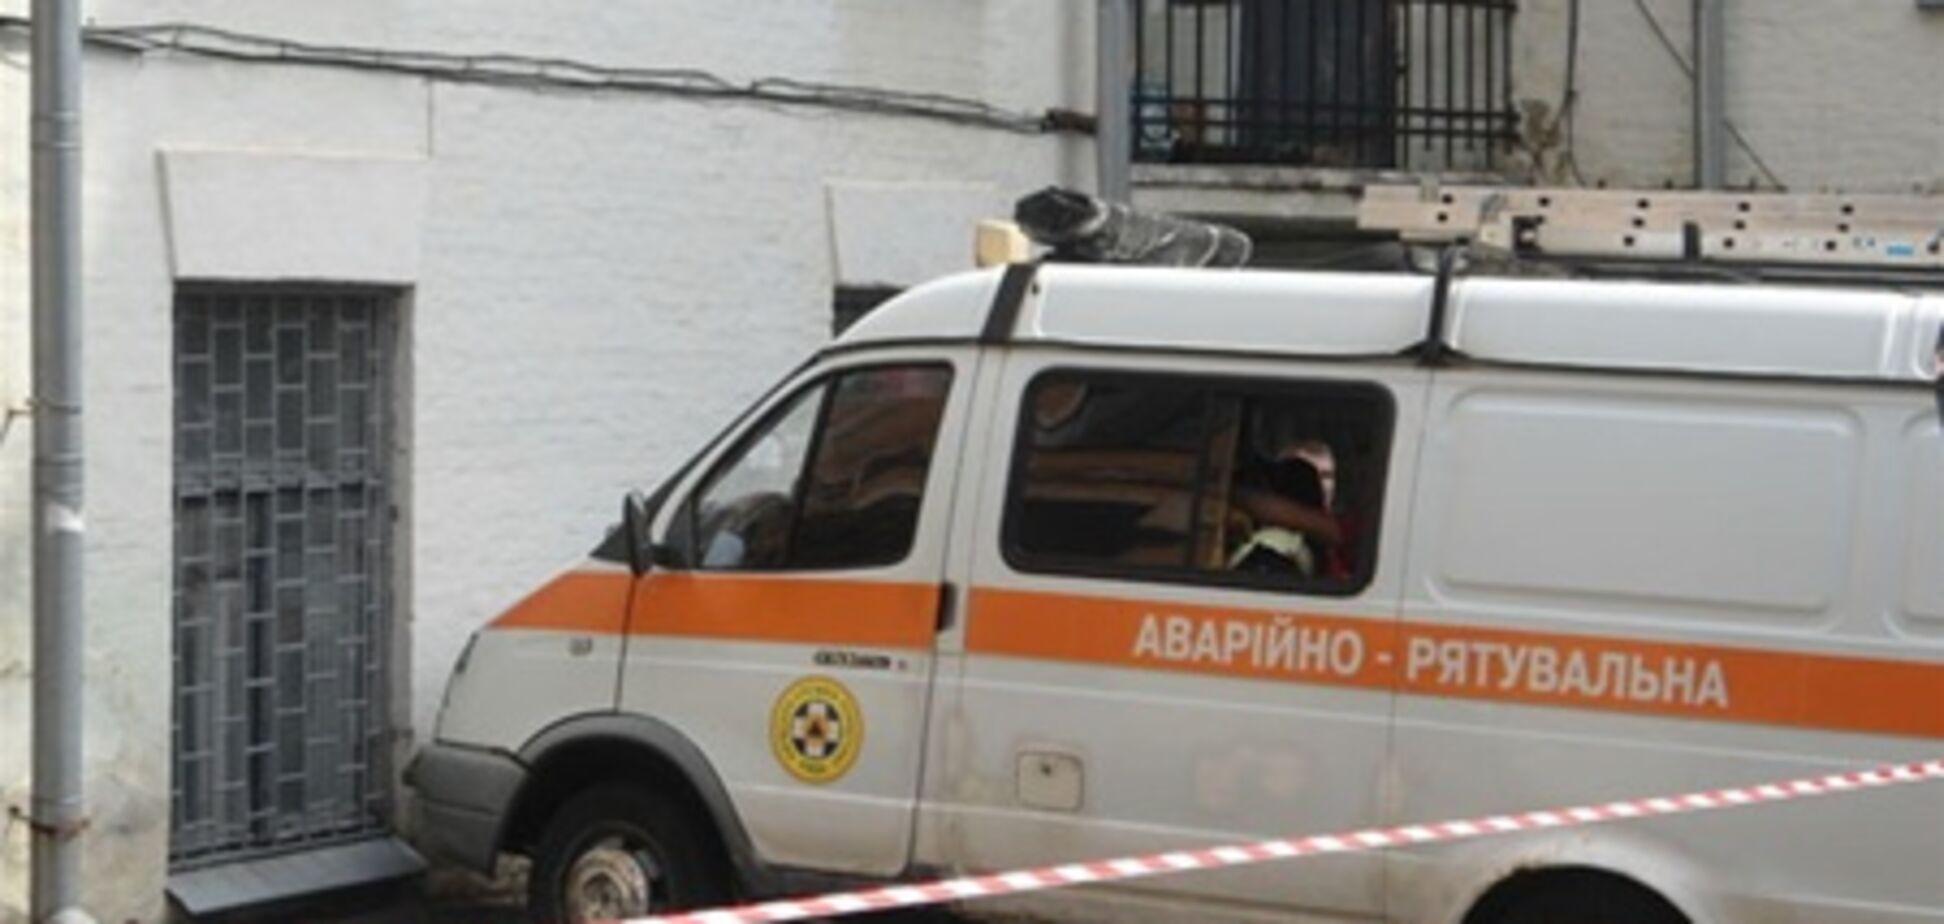 Падение лифта на Пушкинской: подробности аварии